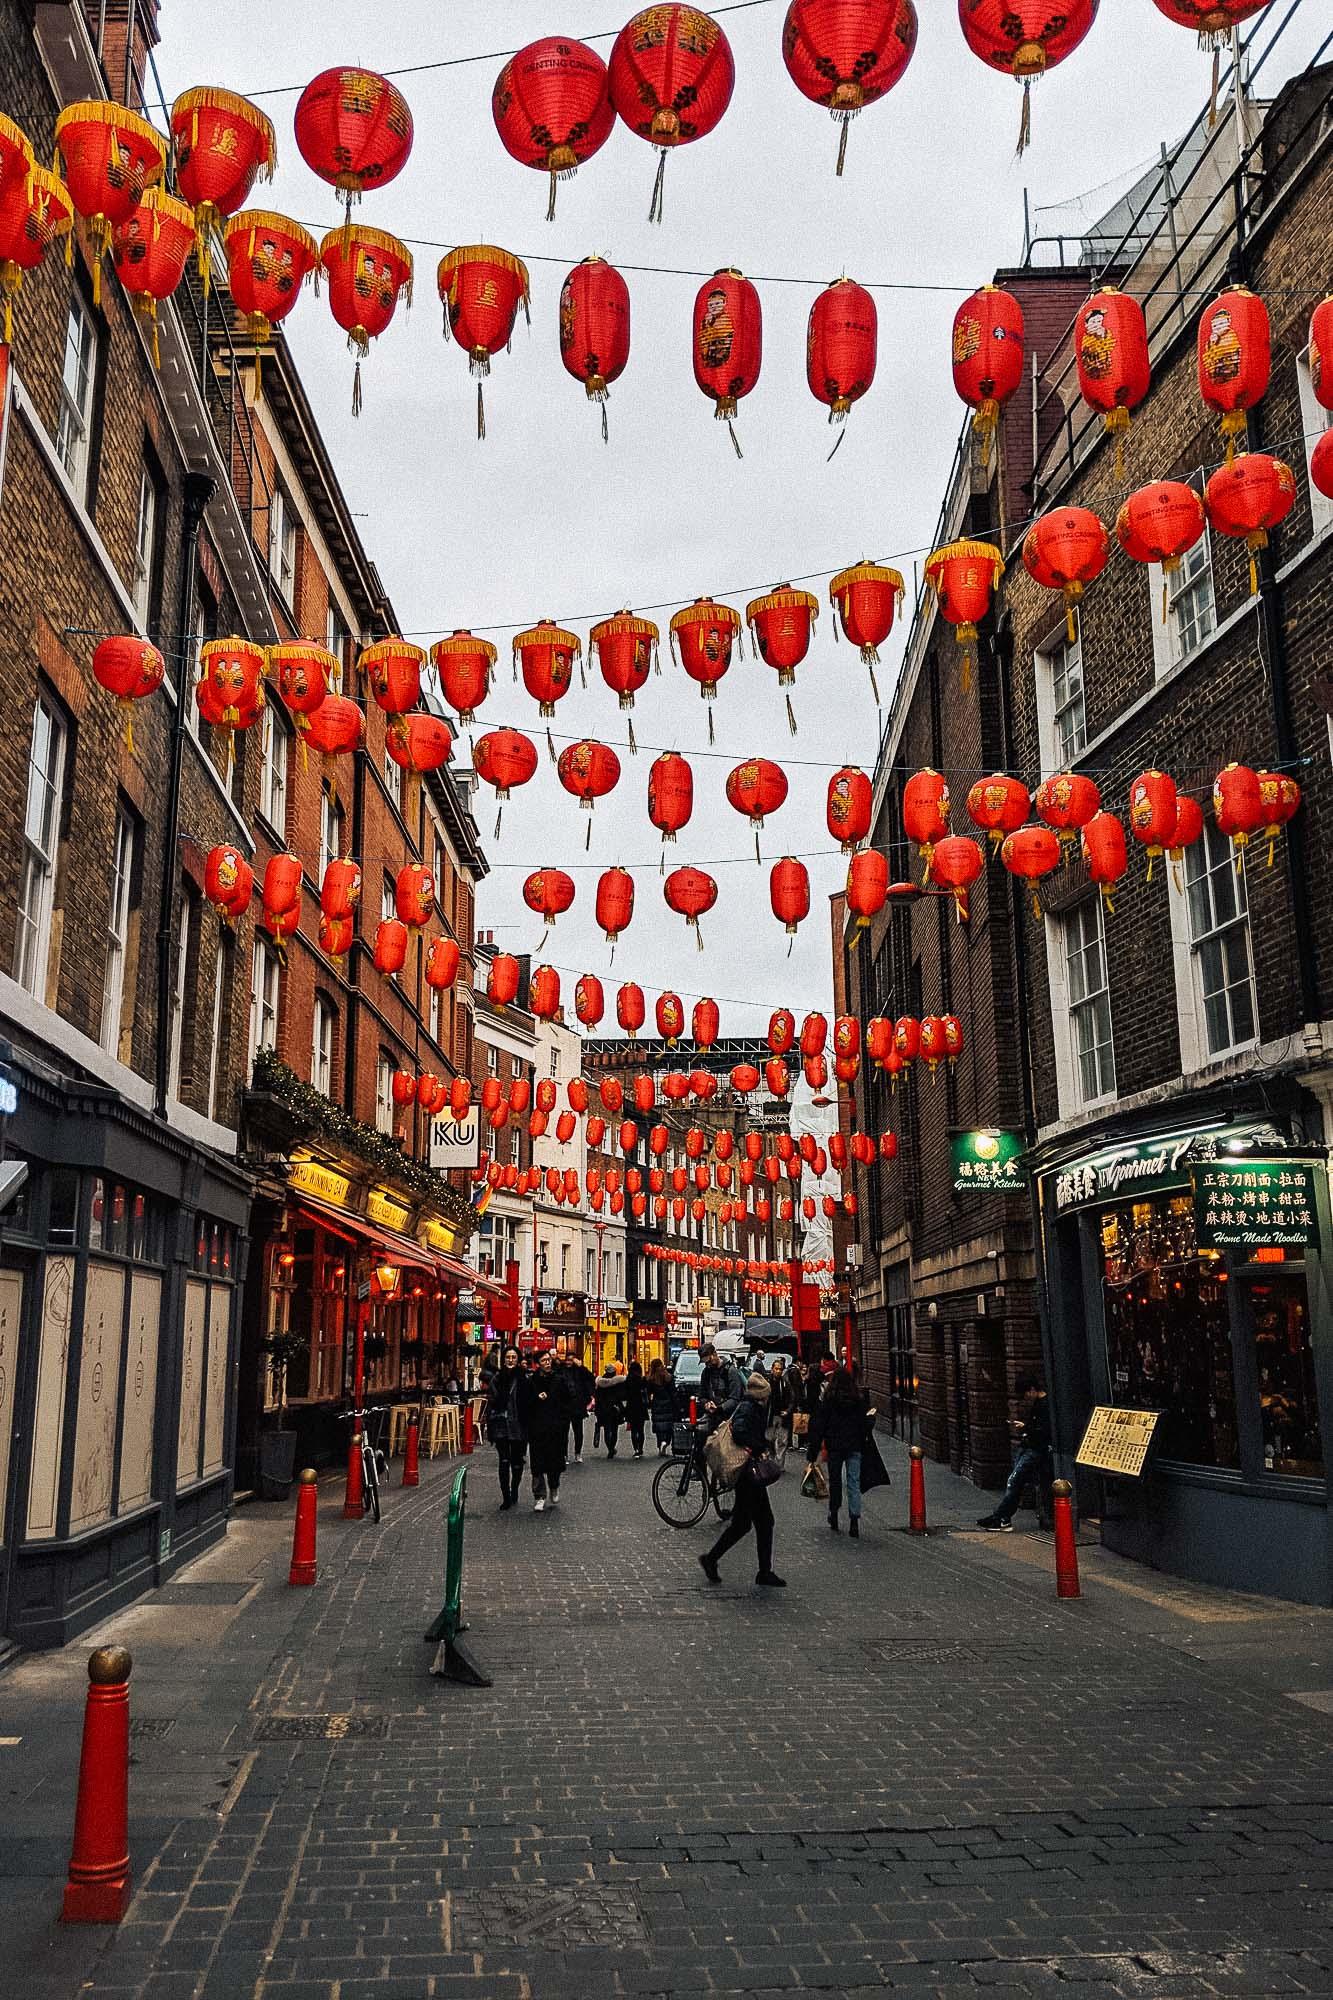 Red Chinese lanterns in Gerrard Street, Chinatown in London, UK